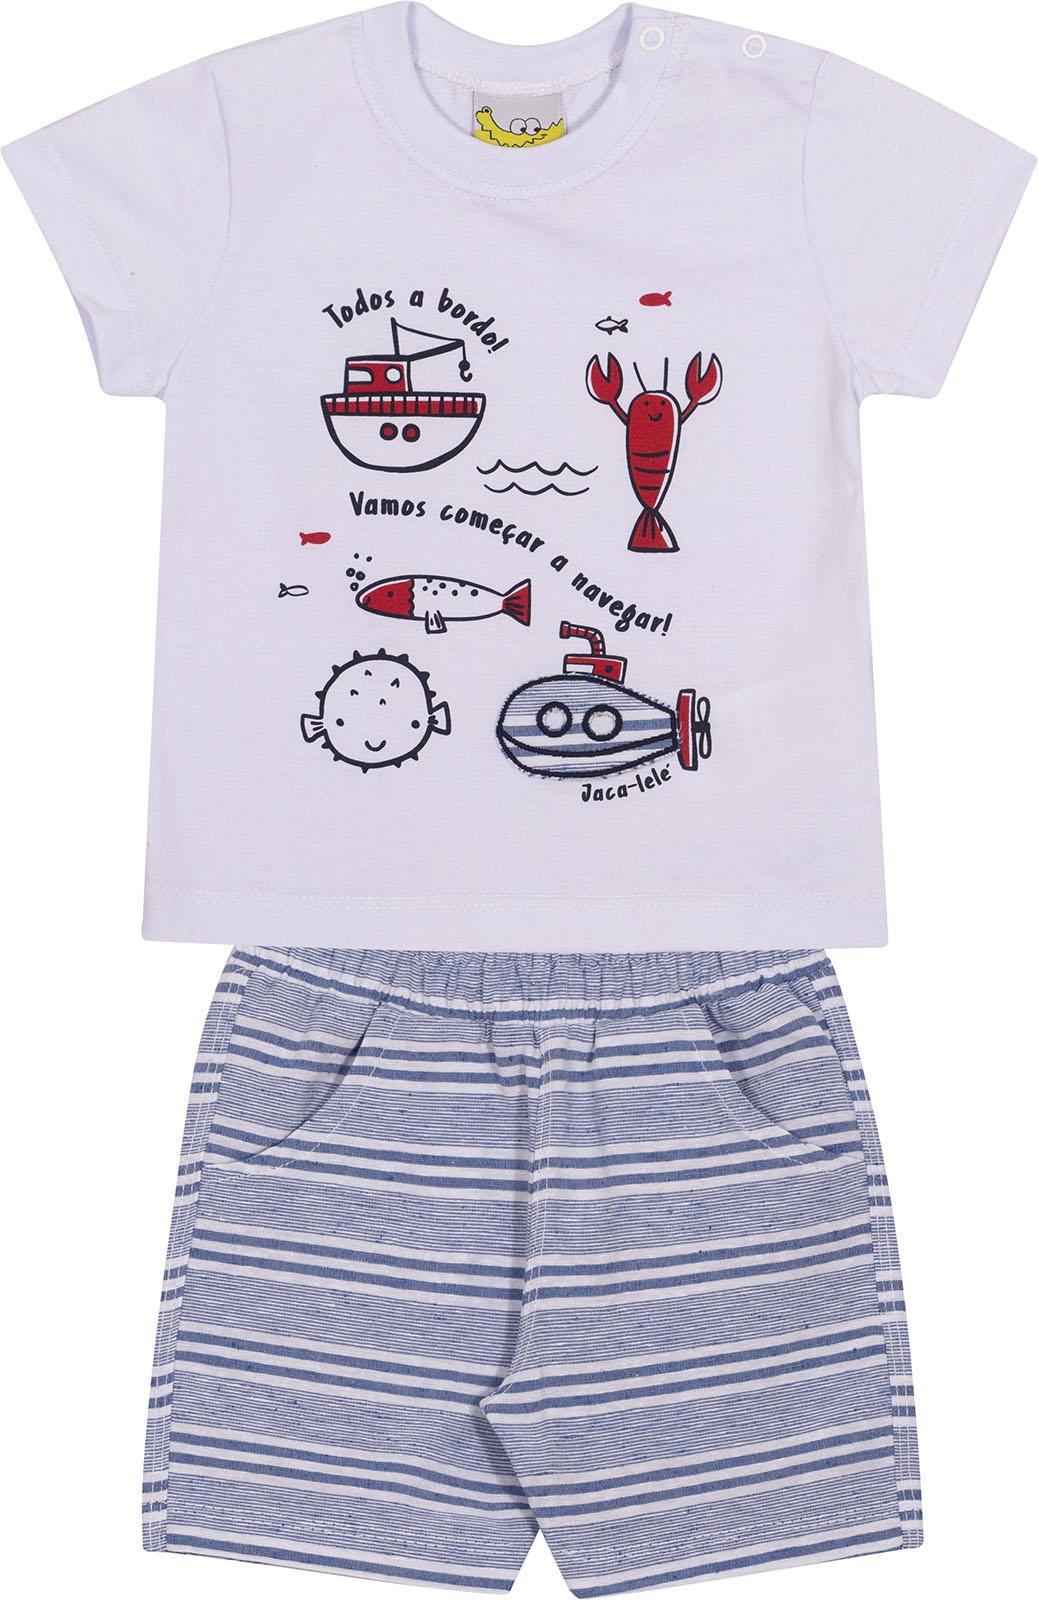 Conjunto Infantil Camiseta e Shorts JACA-LELÉ  Navegar Branco e Azul